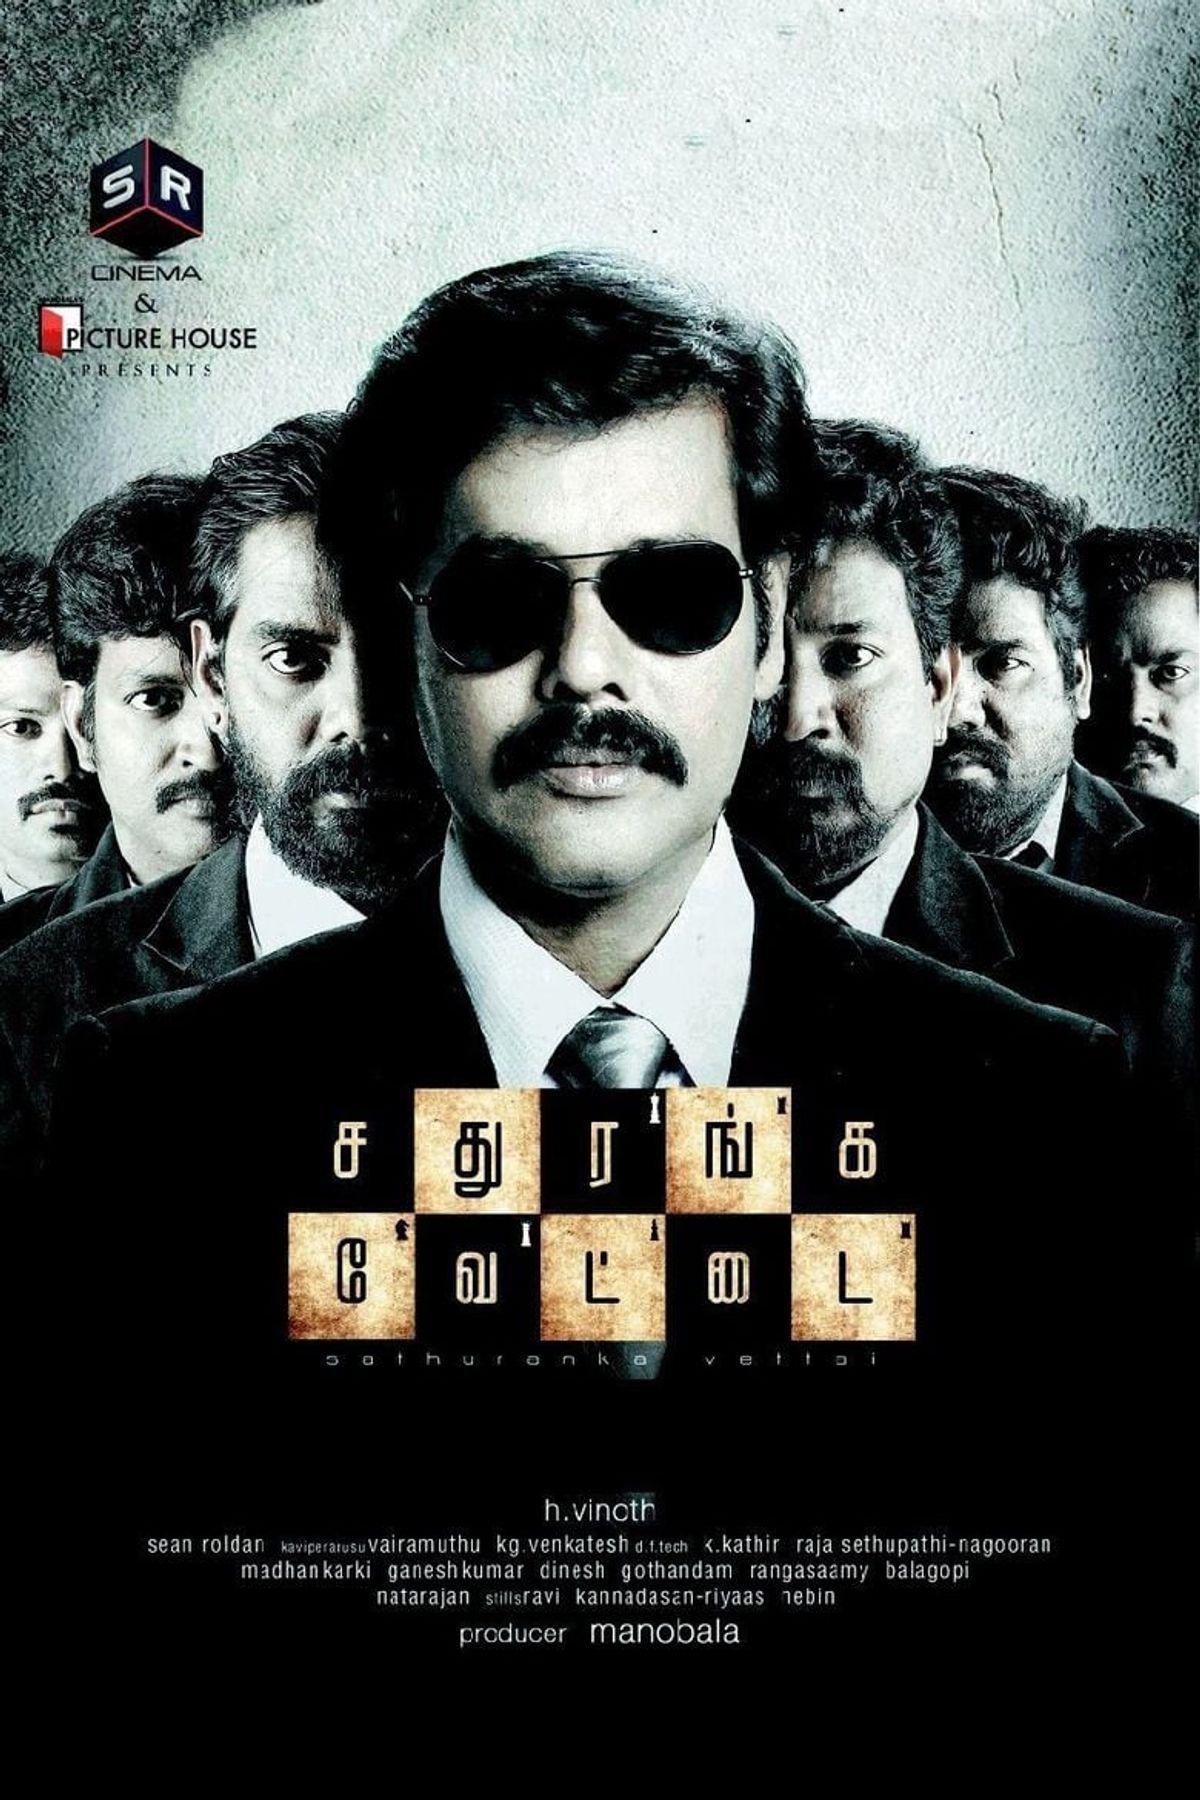 Natarajan Subramaniam Best Movies, TV Shows and Web Series List